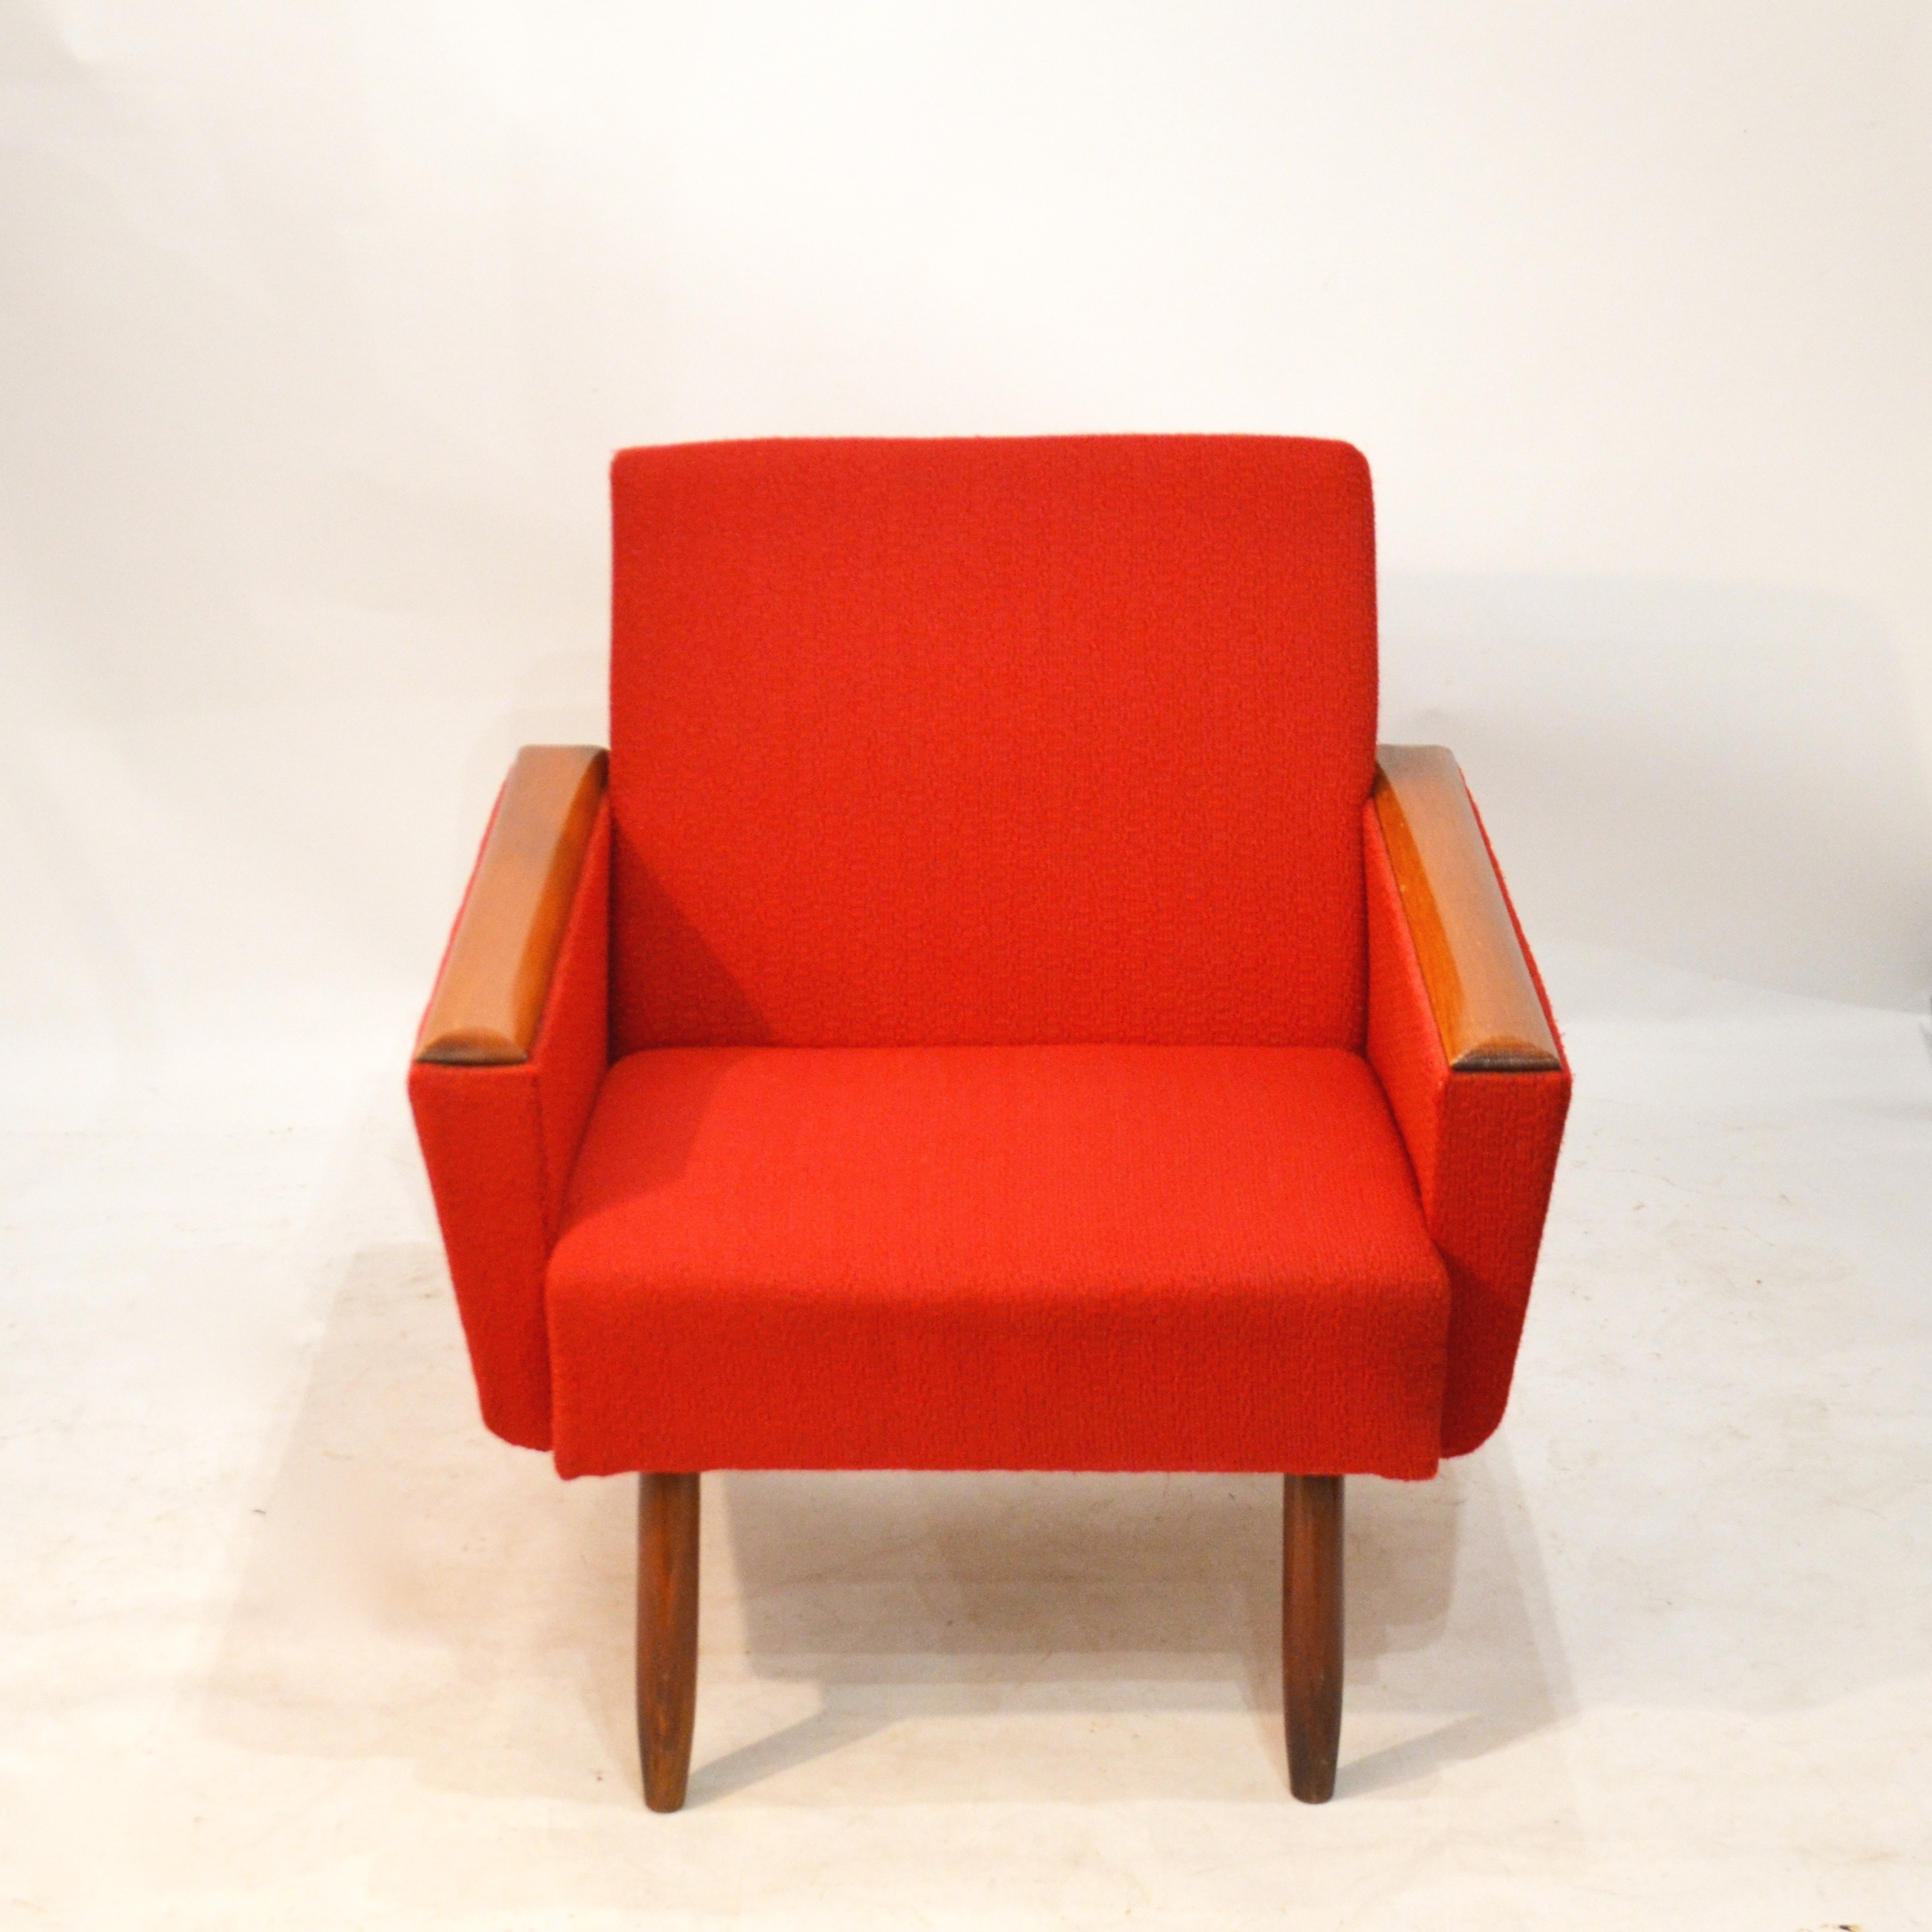 Retapisser Un Fauteuil Prix fauteuils soviétiques - bindiesbindies